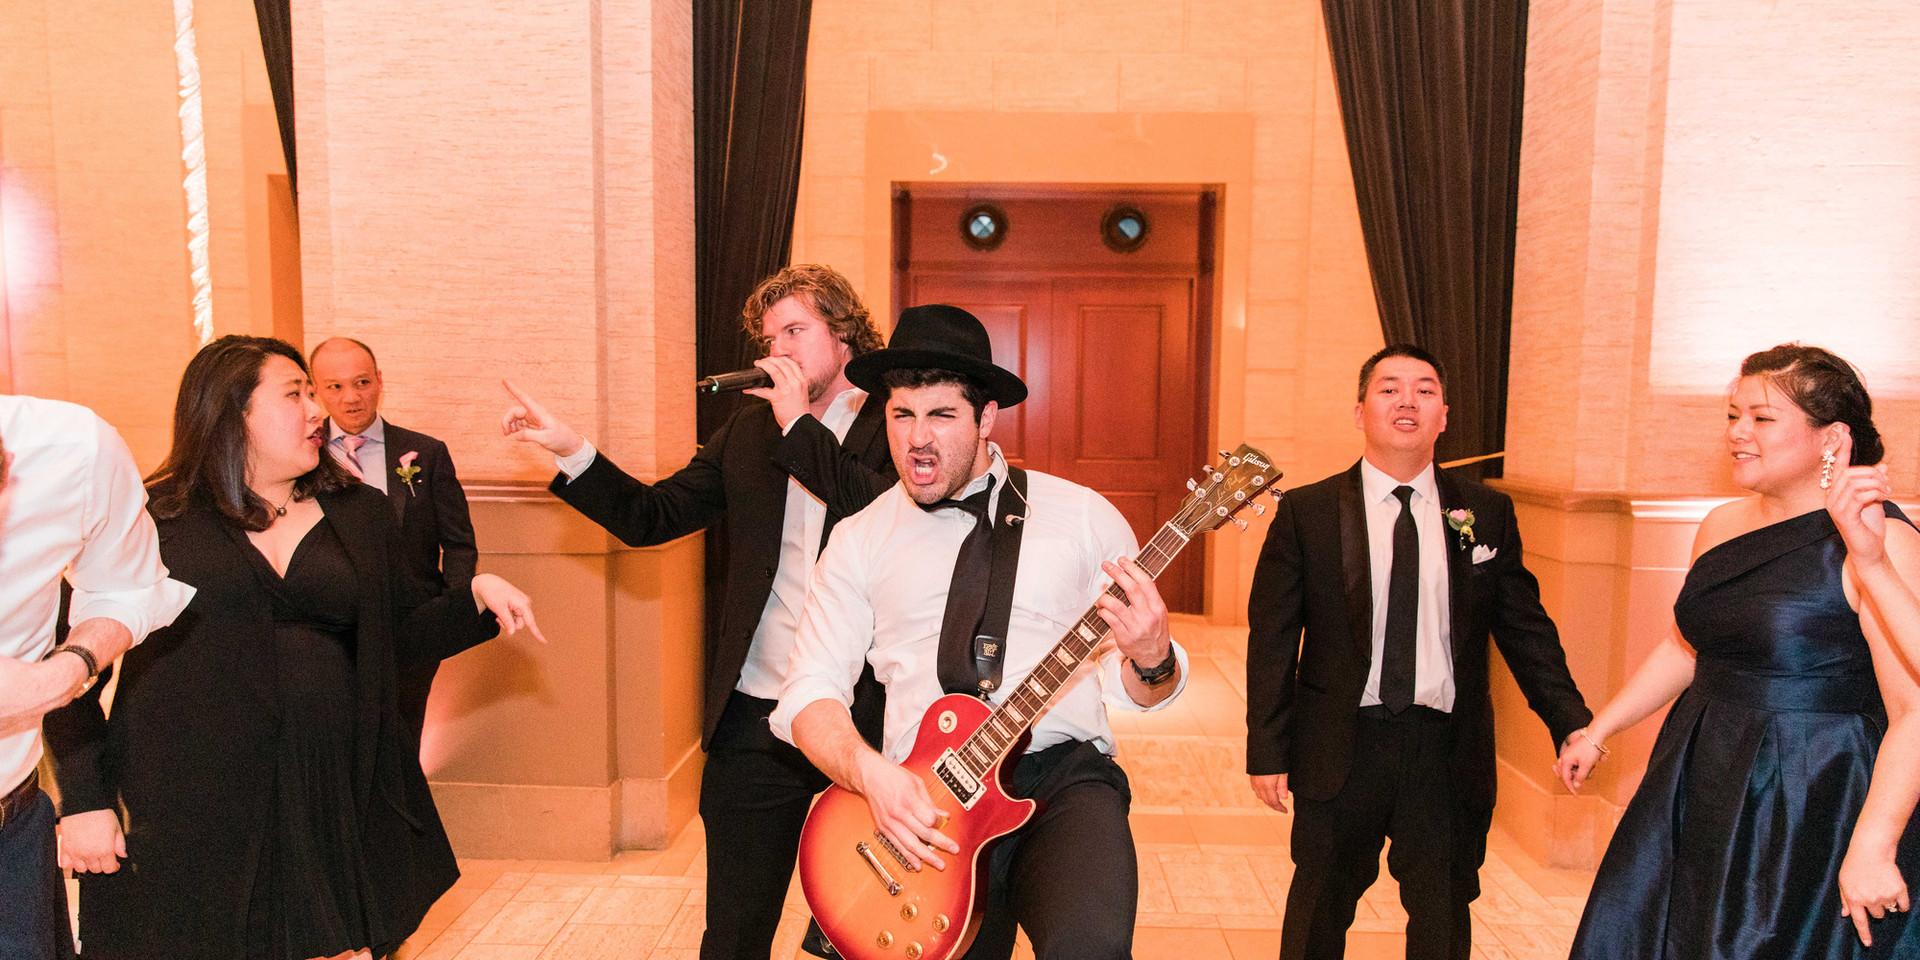 Marina-Eugene-Wedding-by-JBJ-Pictures-49